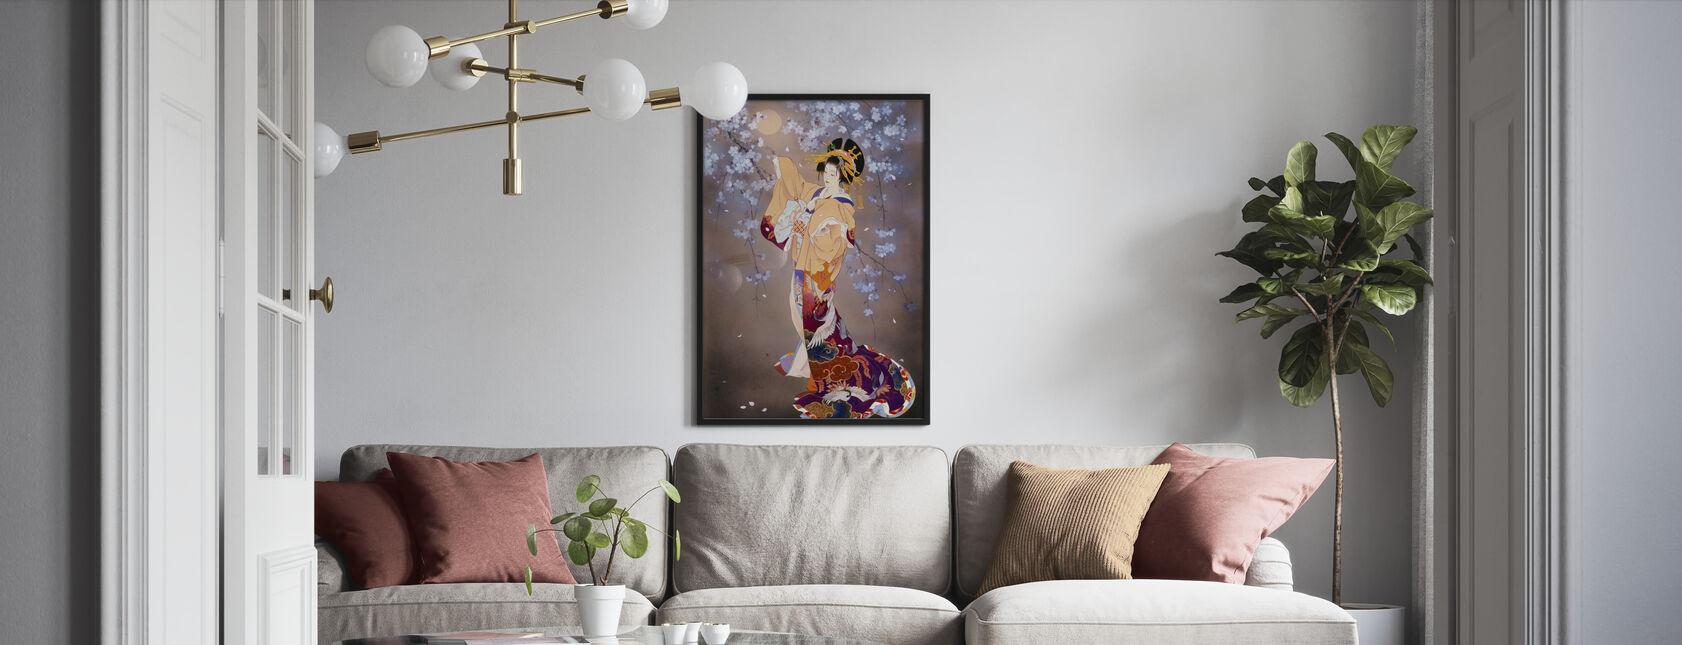 Yoi - Poster - Living Room